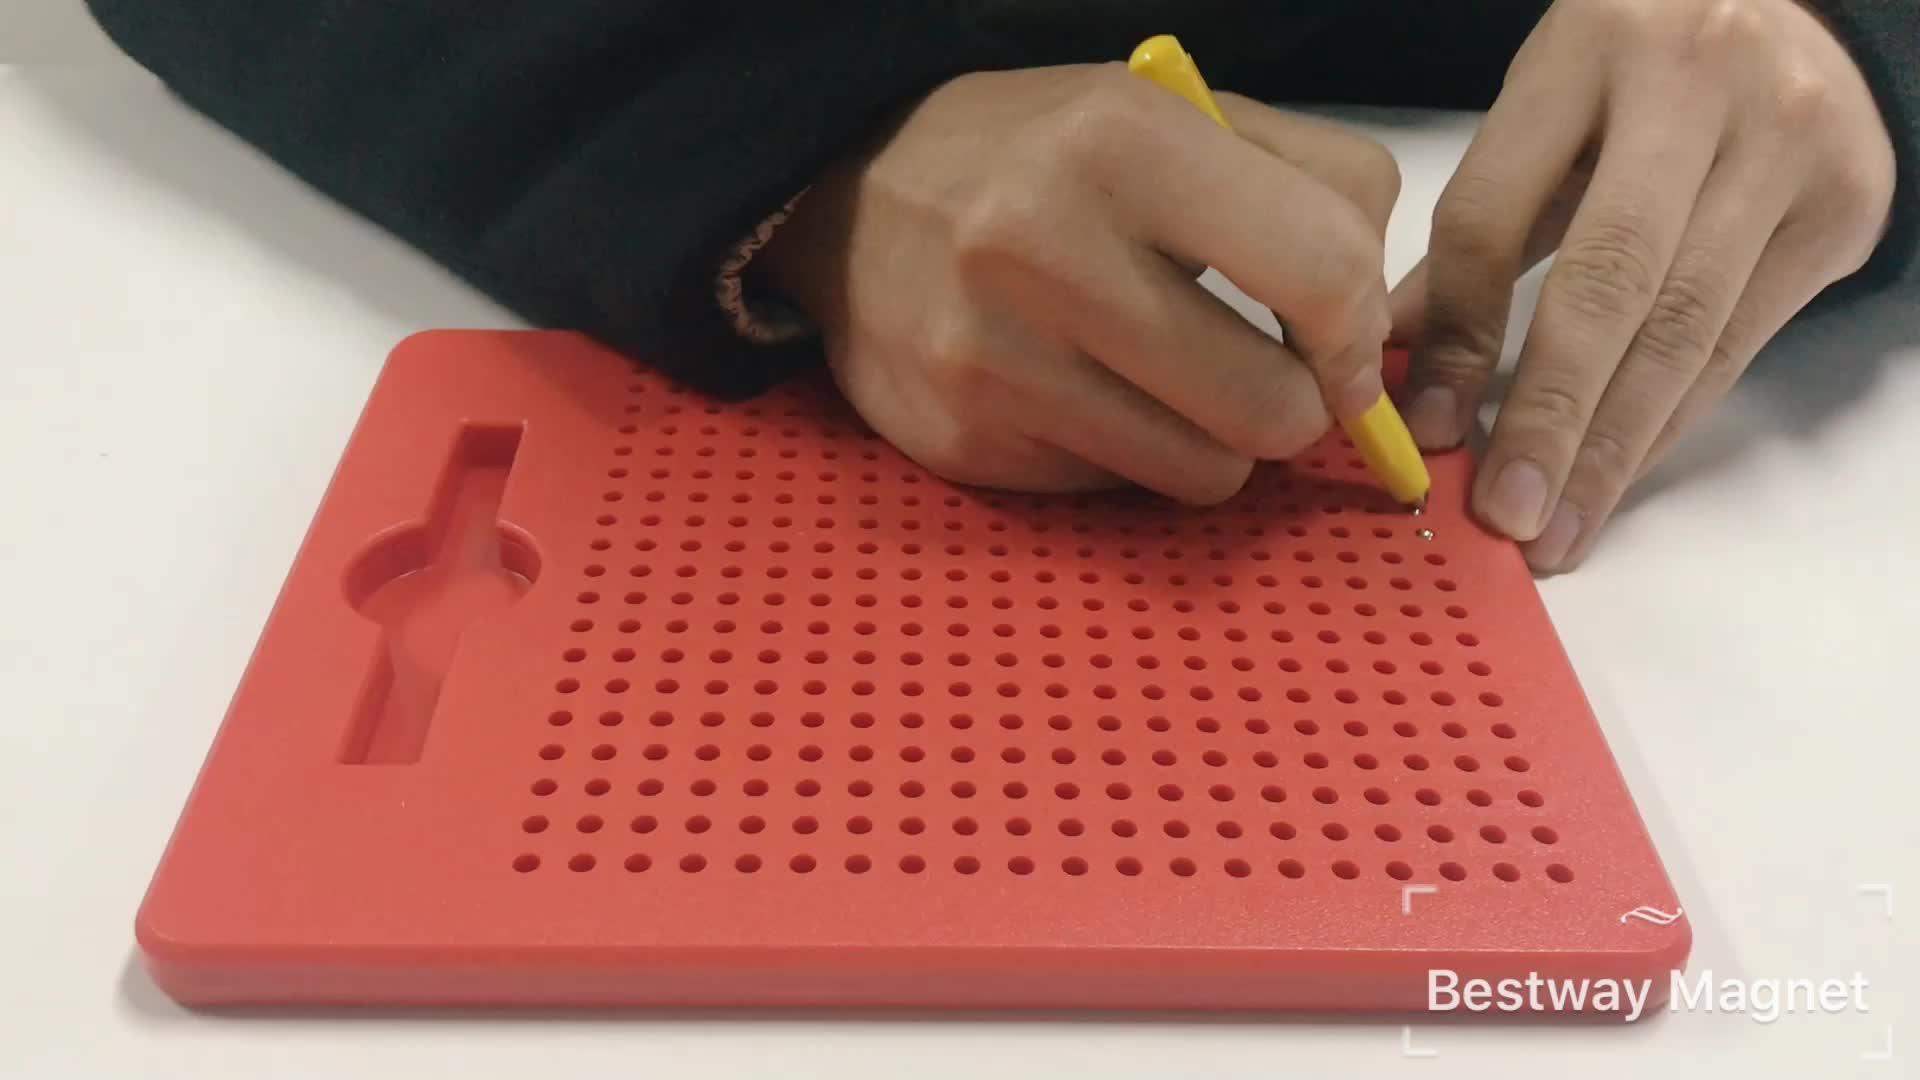 2019 China magnet board For Kids Educational Children Toys For Preshcool